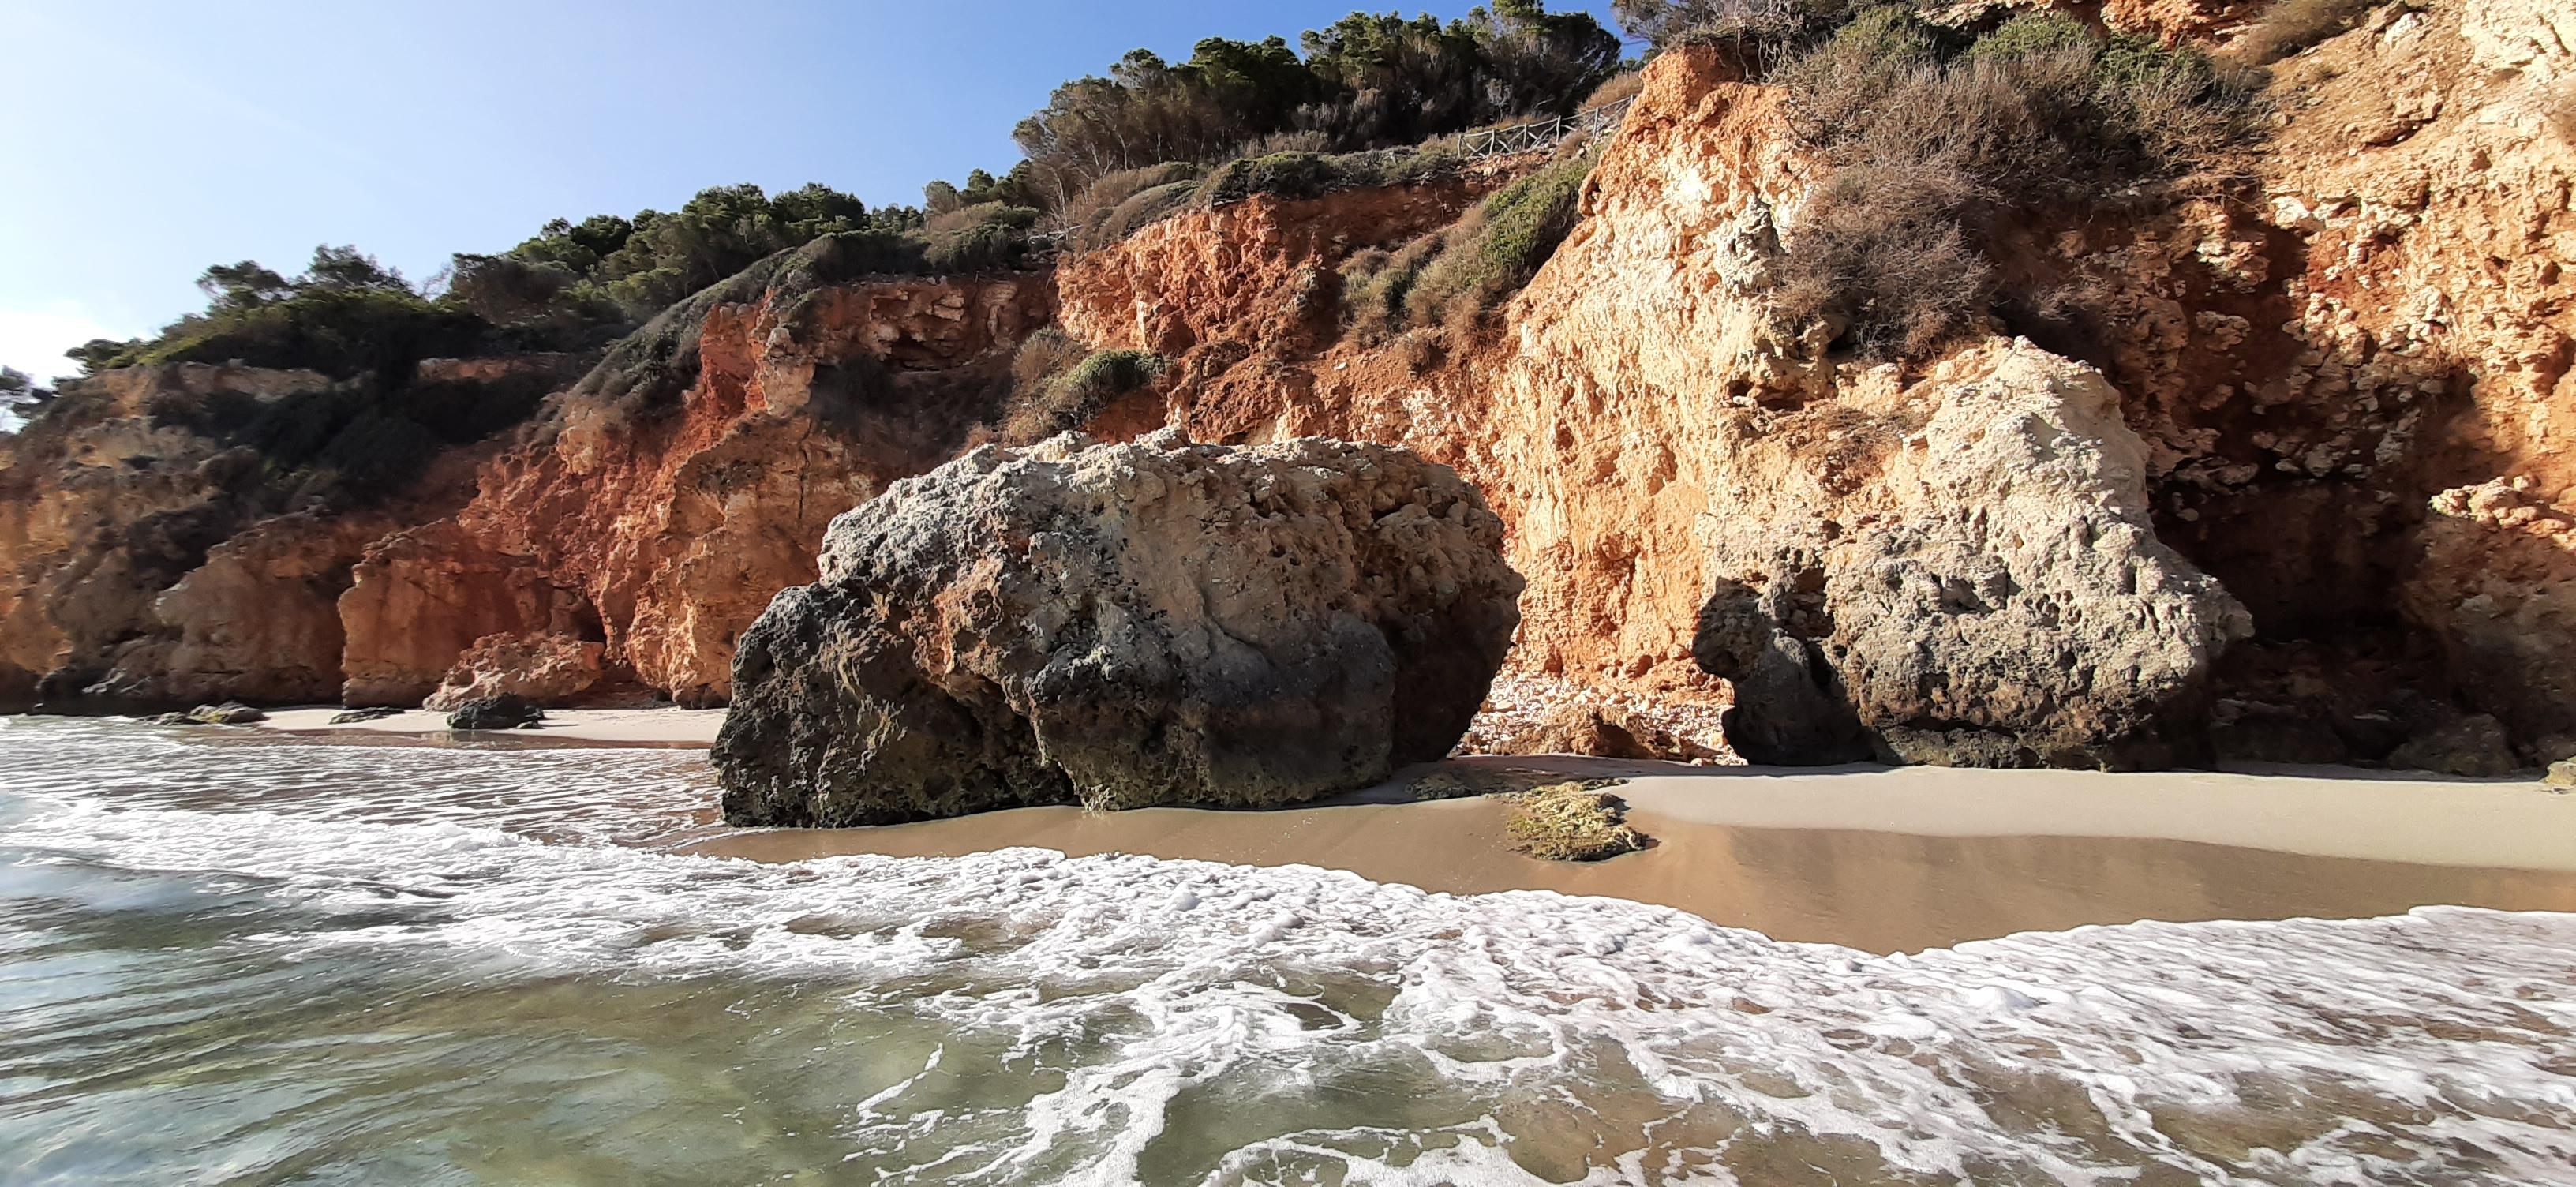 Binigaus, Menorca, 4 mayo 2021